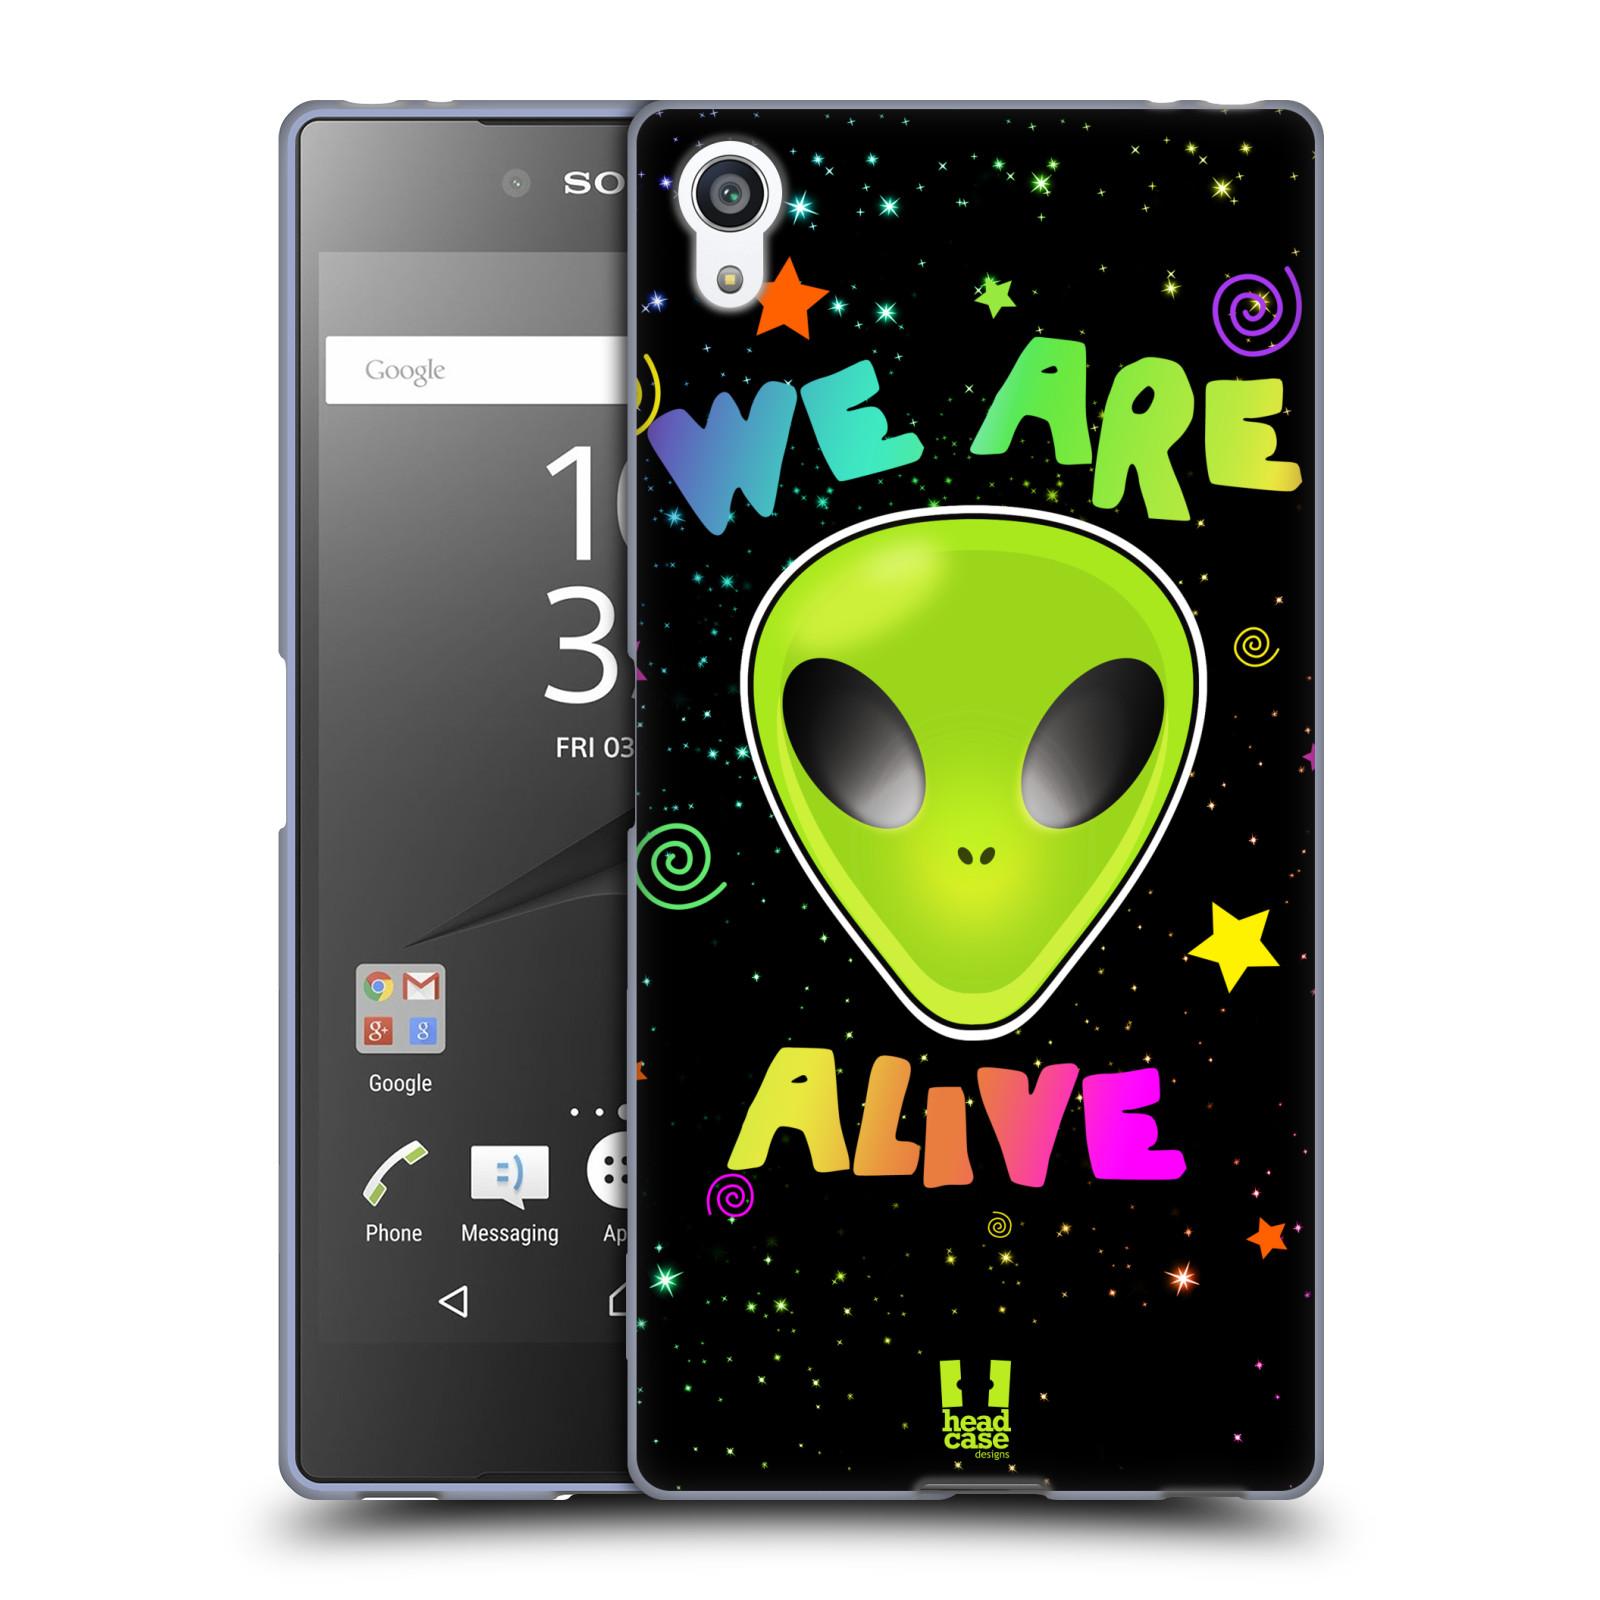 Silikonové pouzdro na mobil Sony Xperia Z5 Premium HEAD CASE ALIENS ALIVE